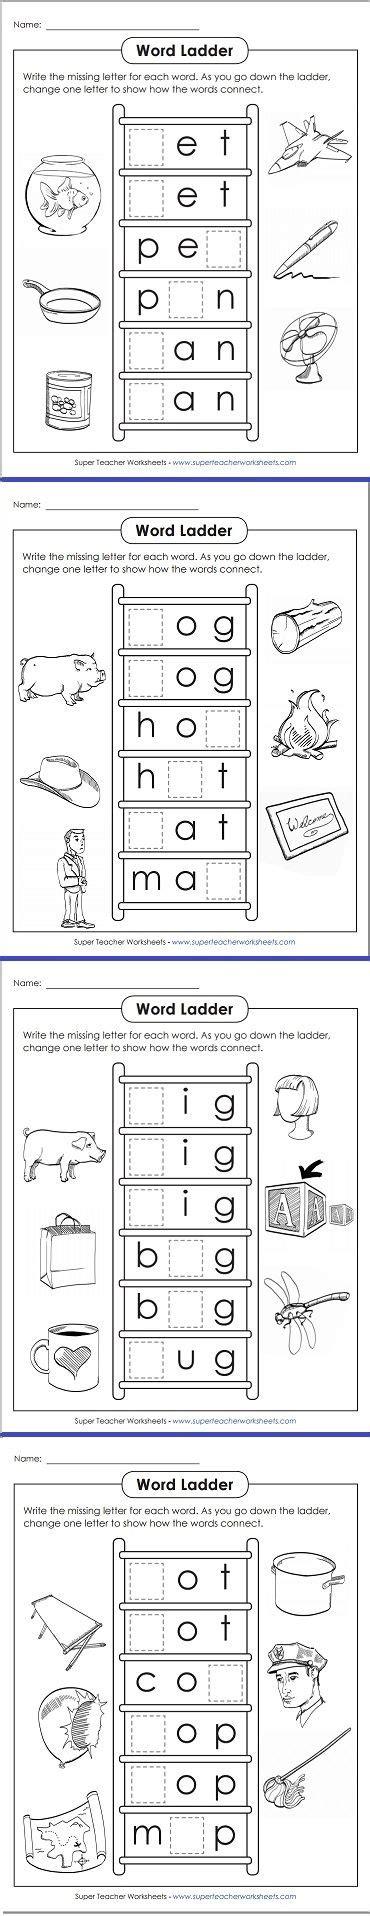 www superteacherworksheets www superteacherworksheets answers math worksheets